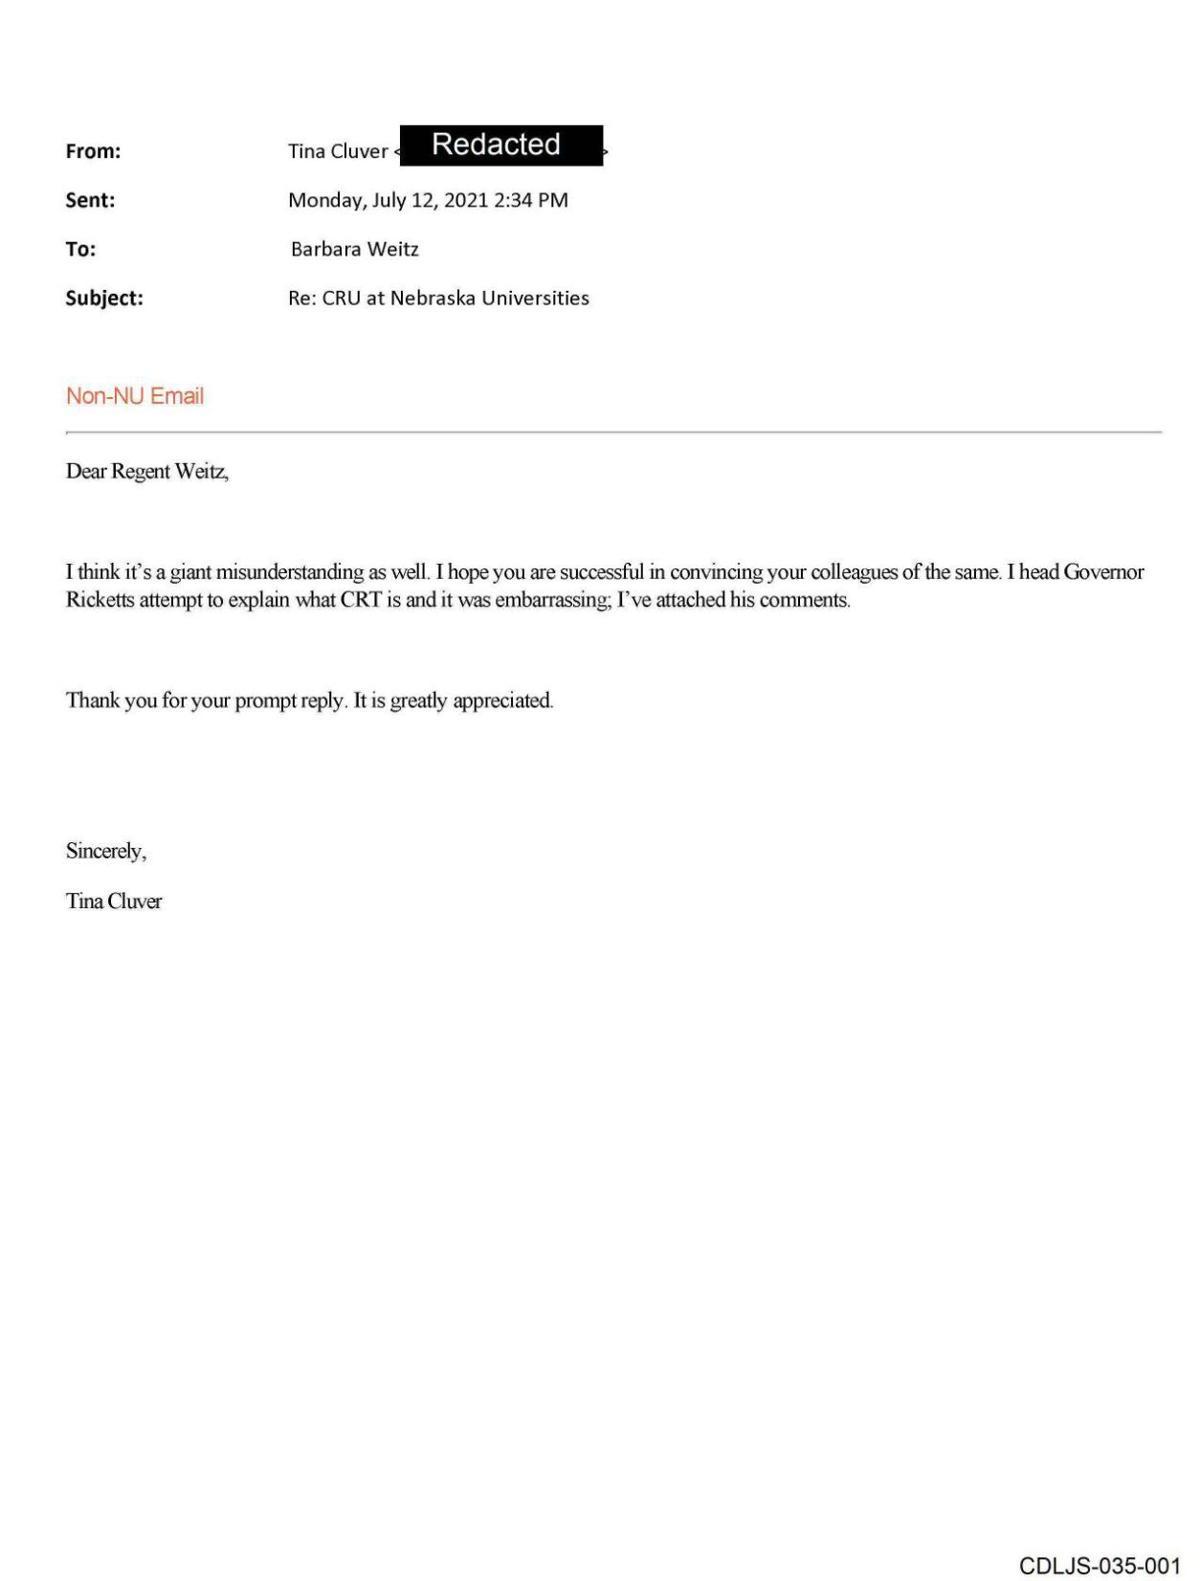 CDLJS-035-001.pdf